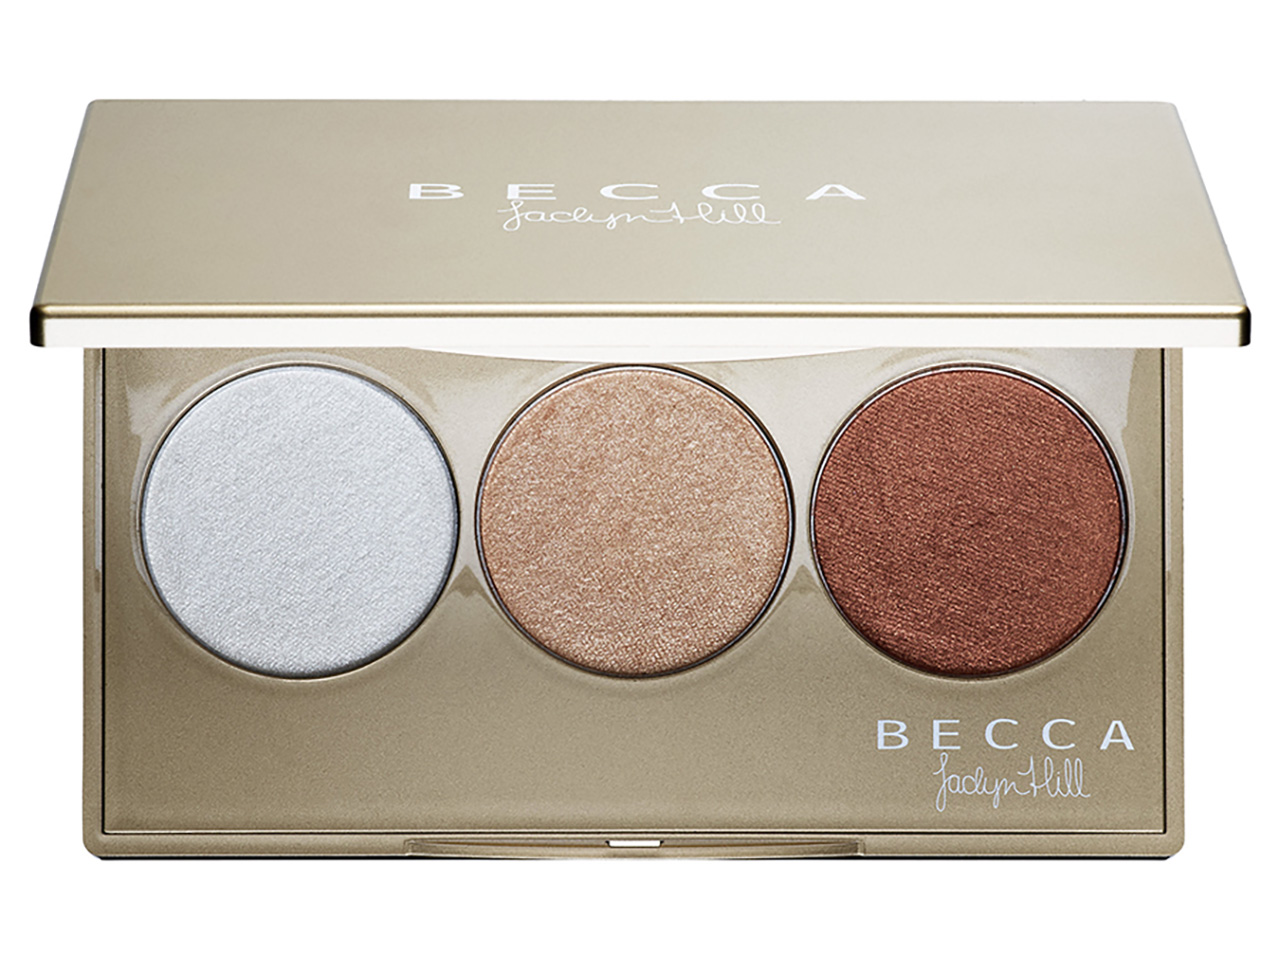 Палетка хайлайтеров Becca Shimmering Skin Perfector Pressed Champagne Glow Palette, цена: $34